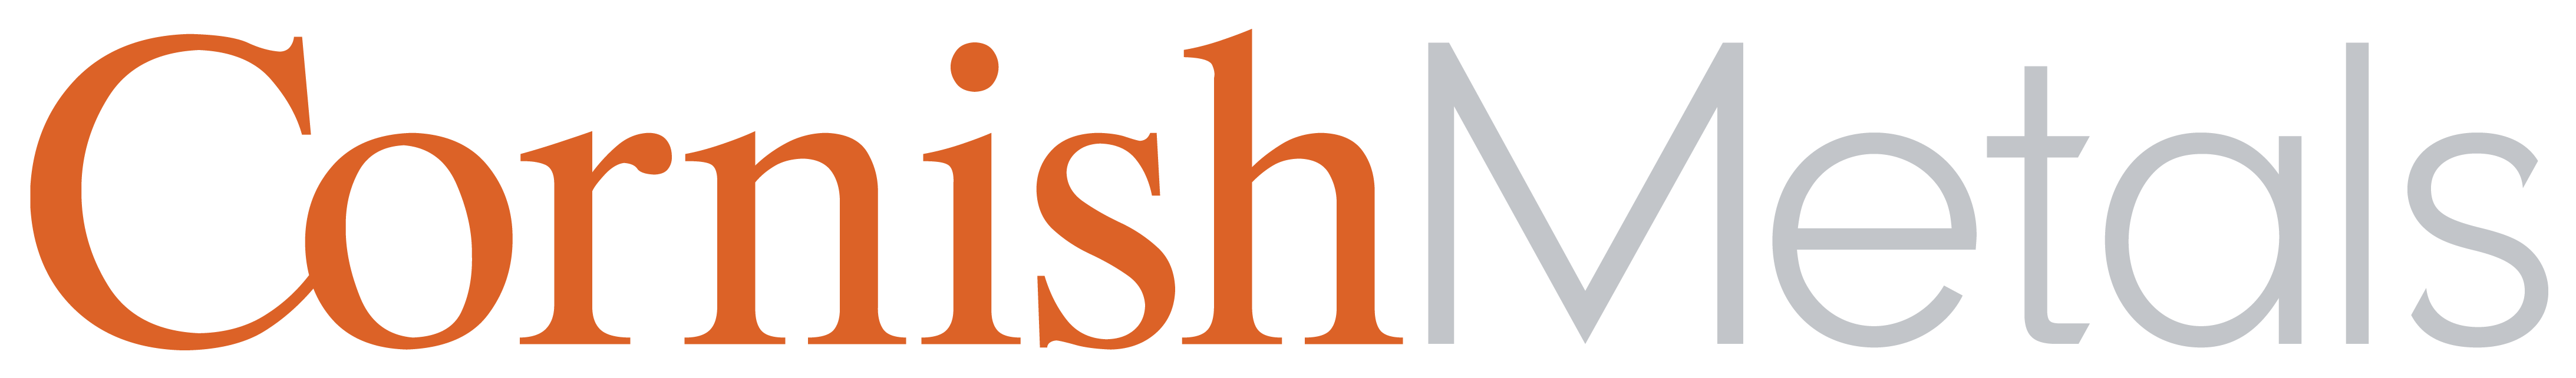 CORNISH METALS INC. Logo